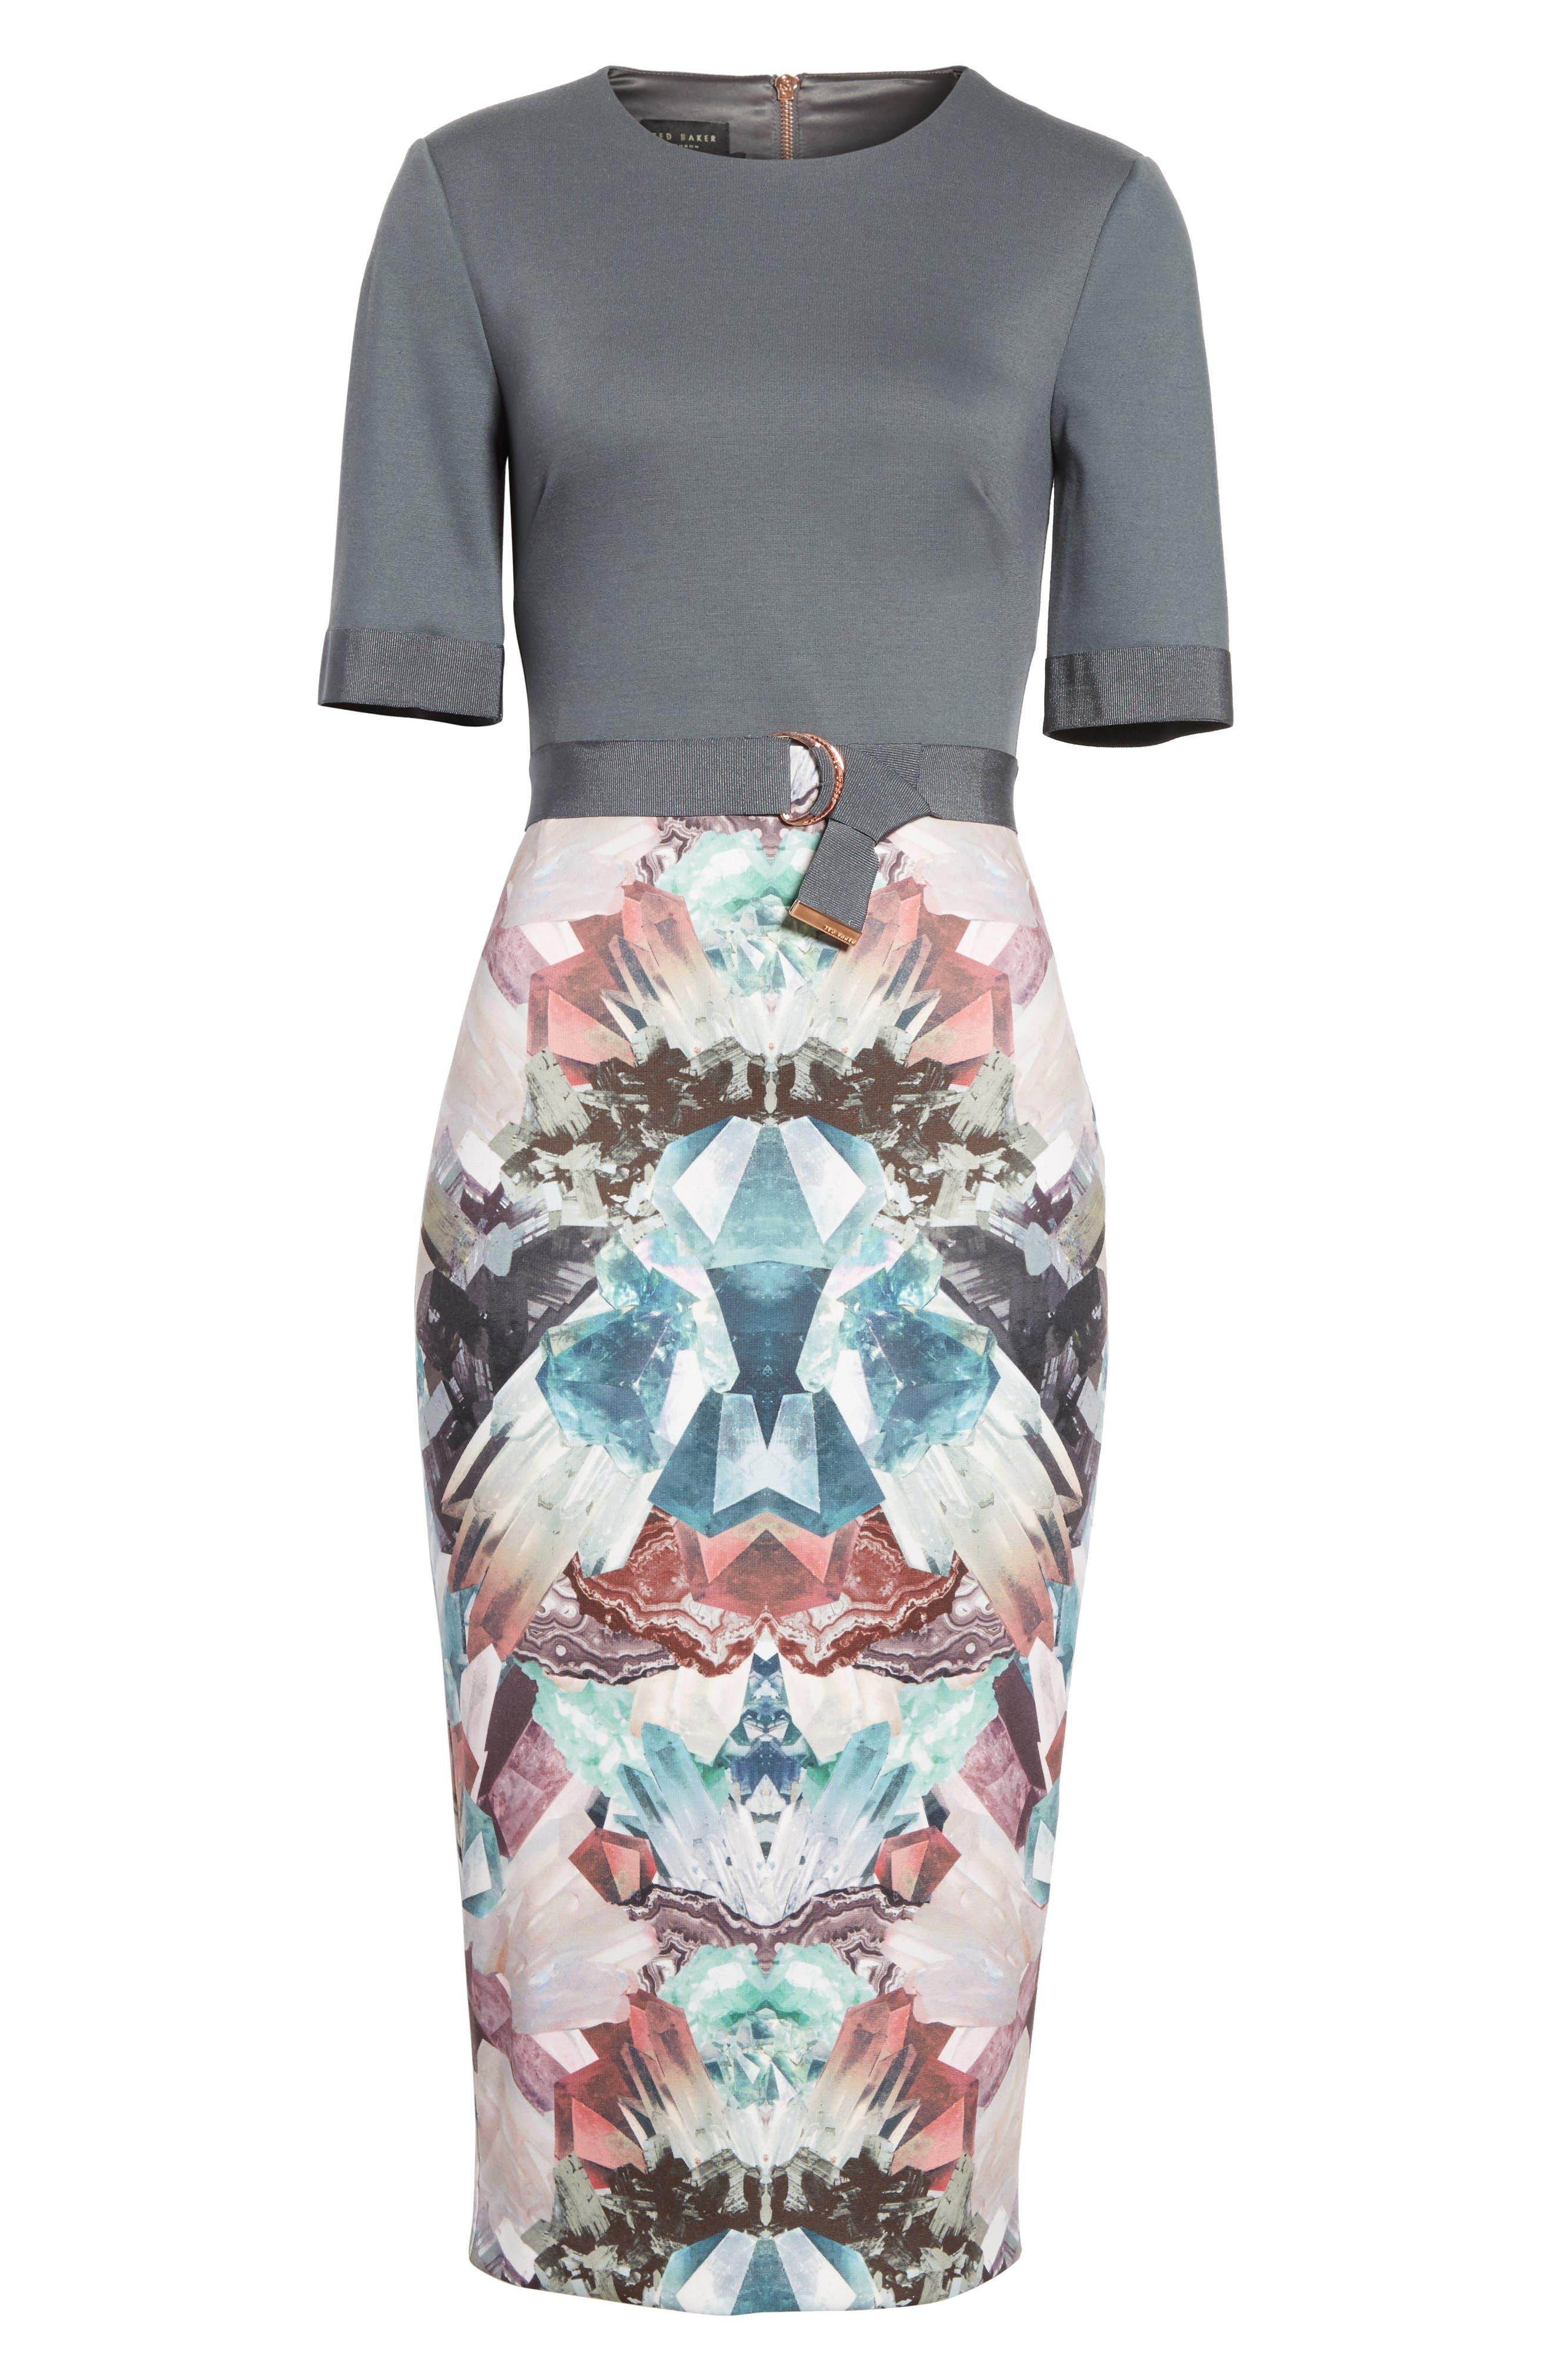 Anaste Mirror Minerals Print Dress,                             Alternate thumbnail 6, color,                             021